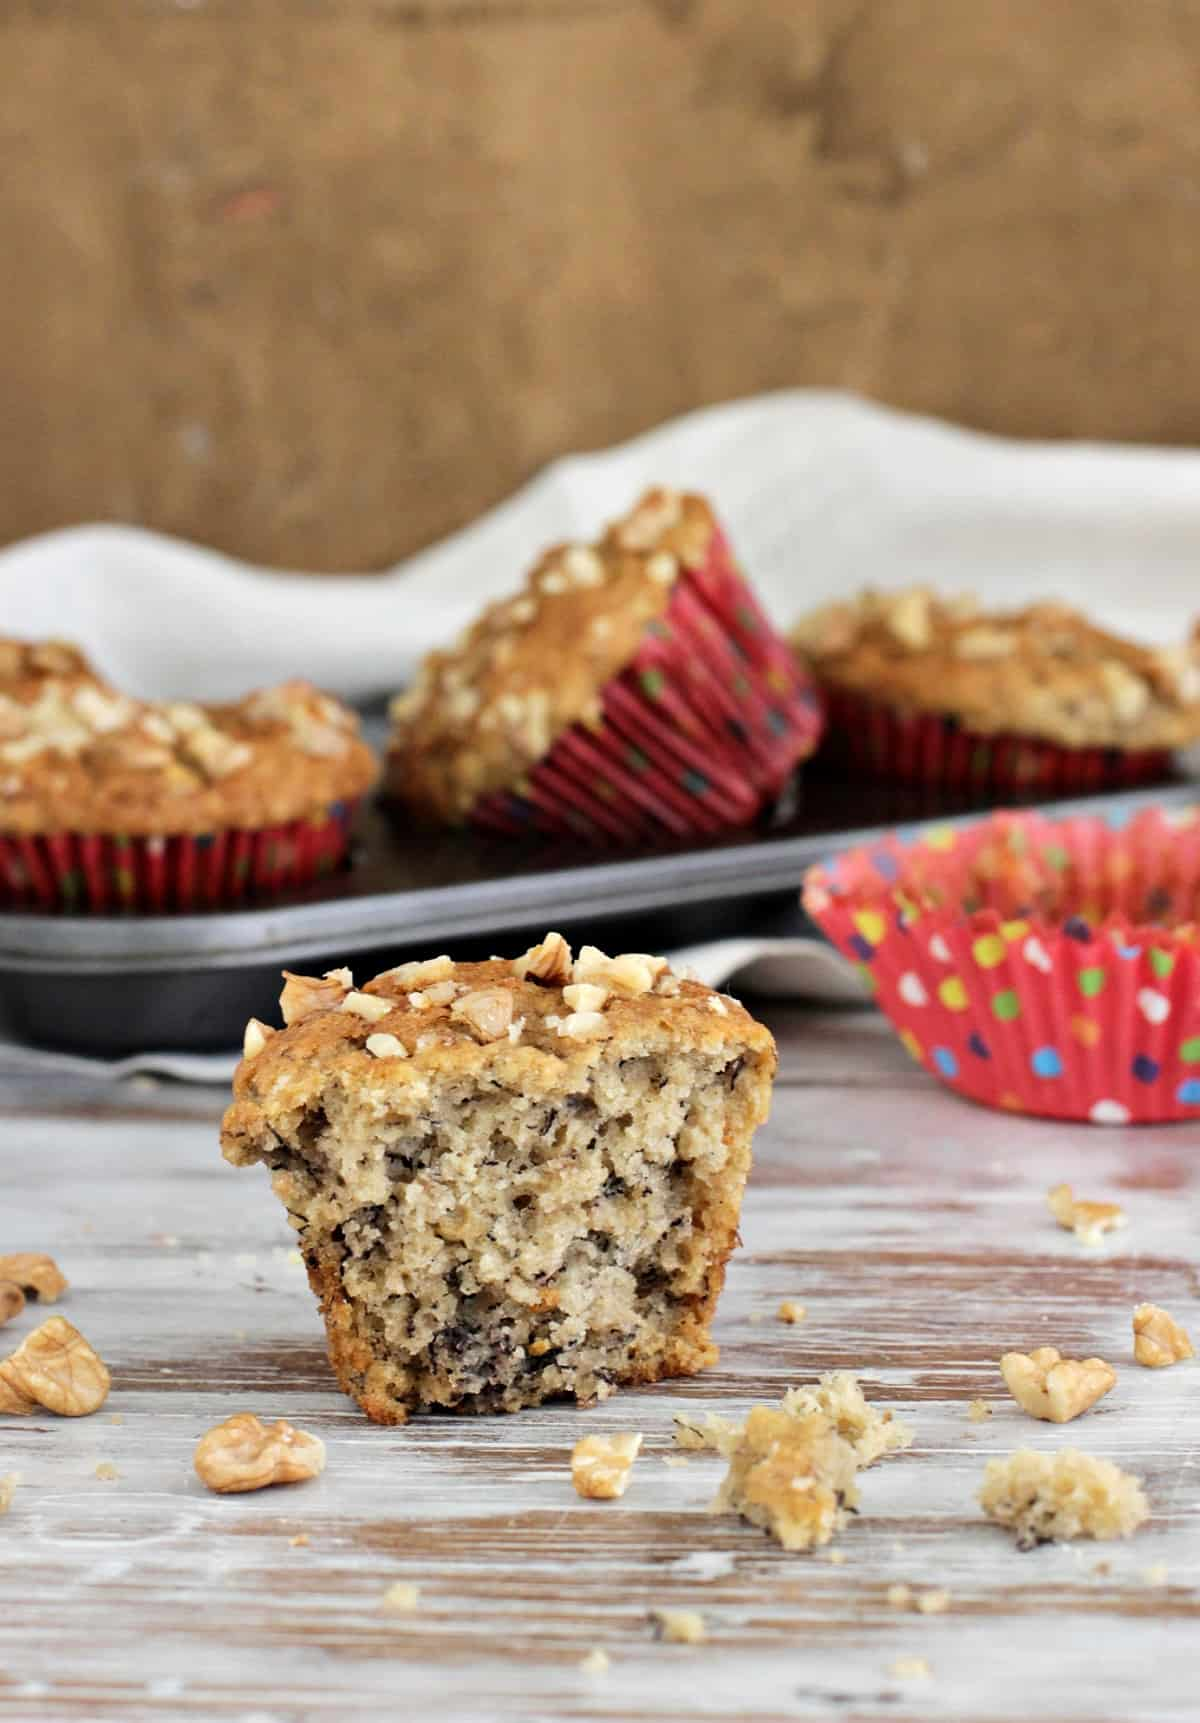 My favorite healthier banana muffins